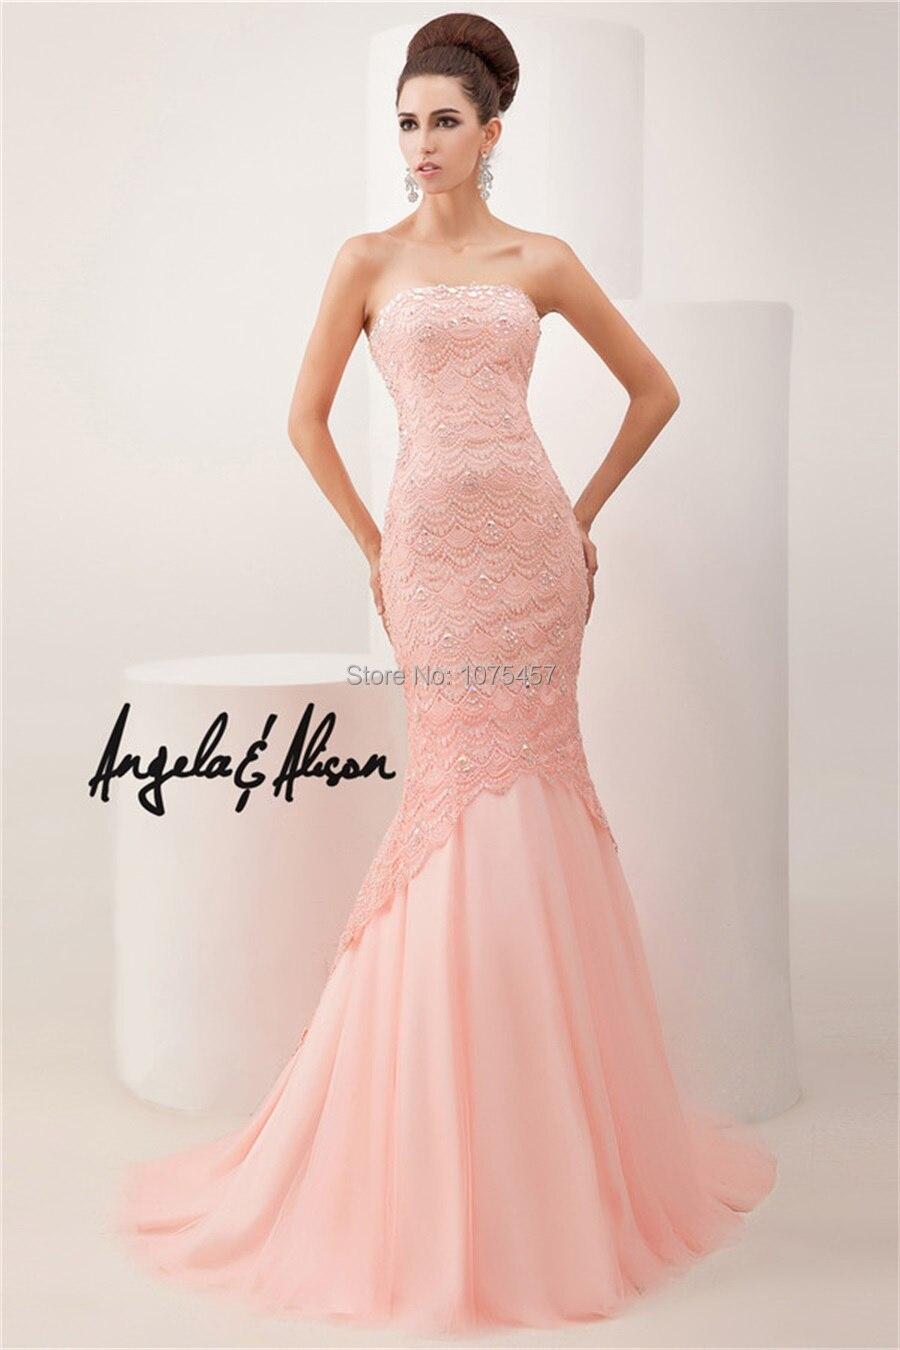 Pink Strapless Mermaid Prom Dress